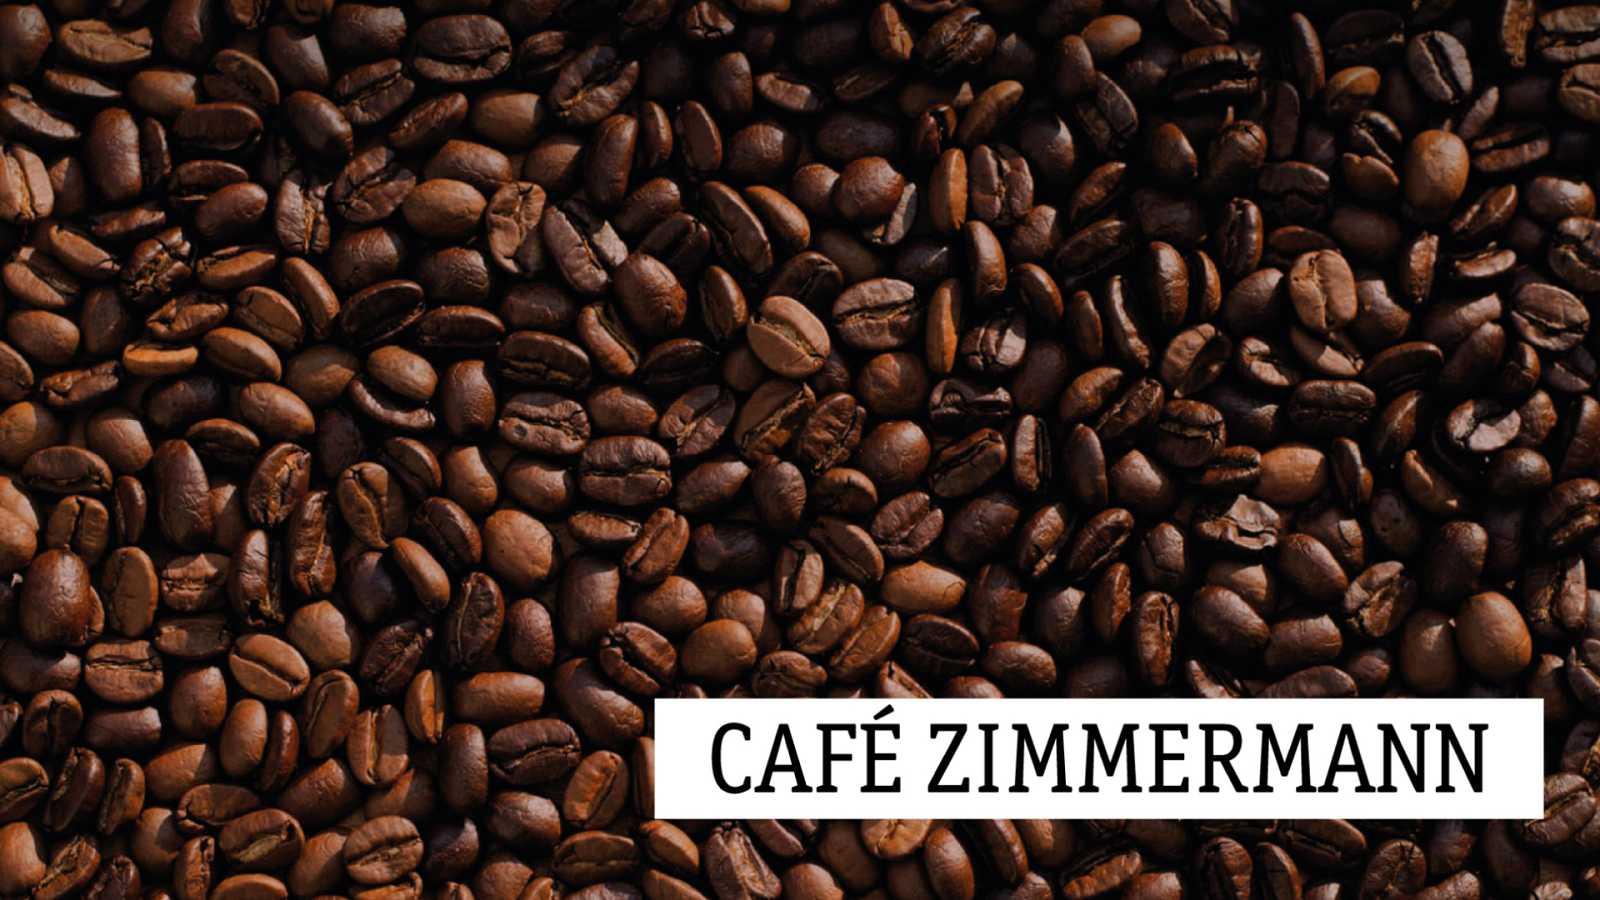 Café Zimmermann - Expreso a Núremberg - 09/11/20 - escuchar ahora